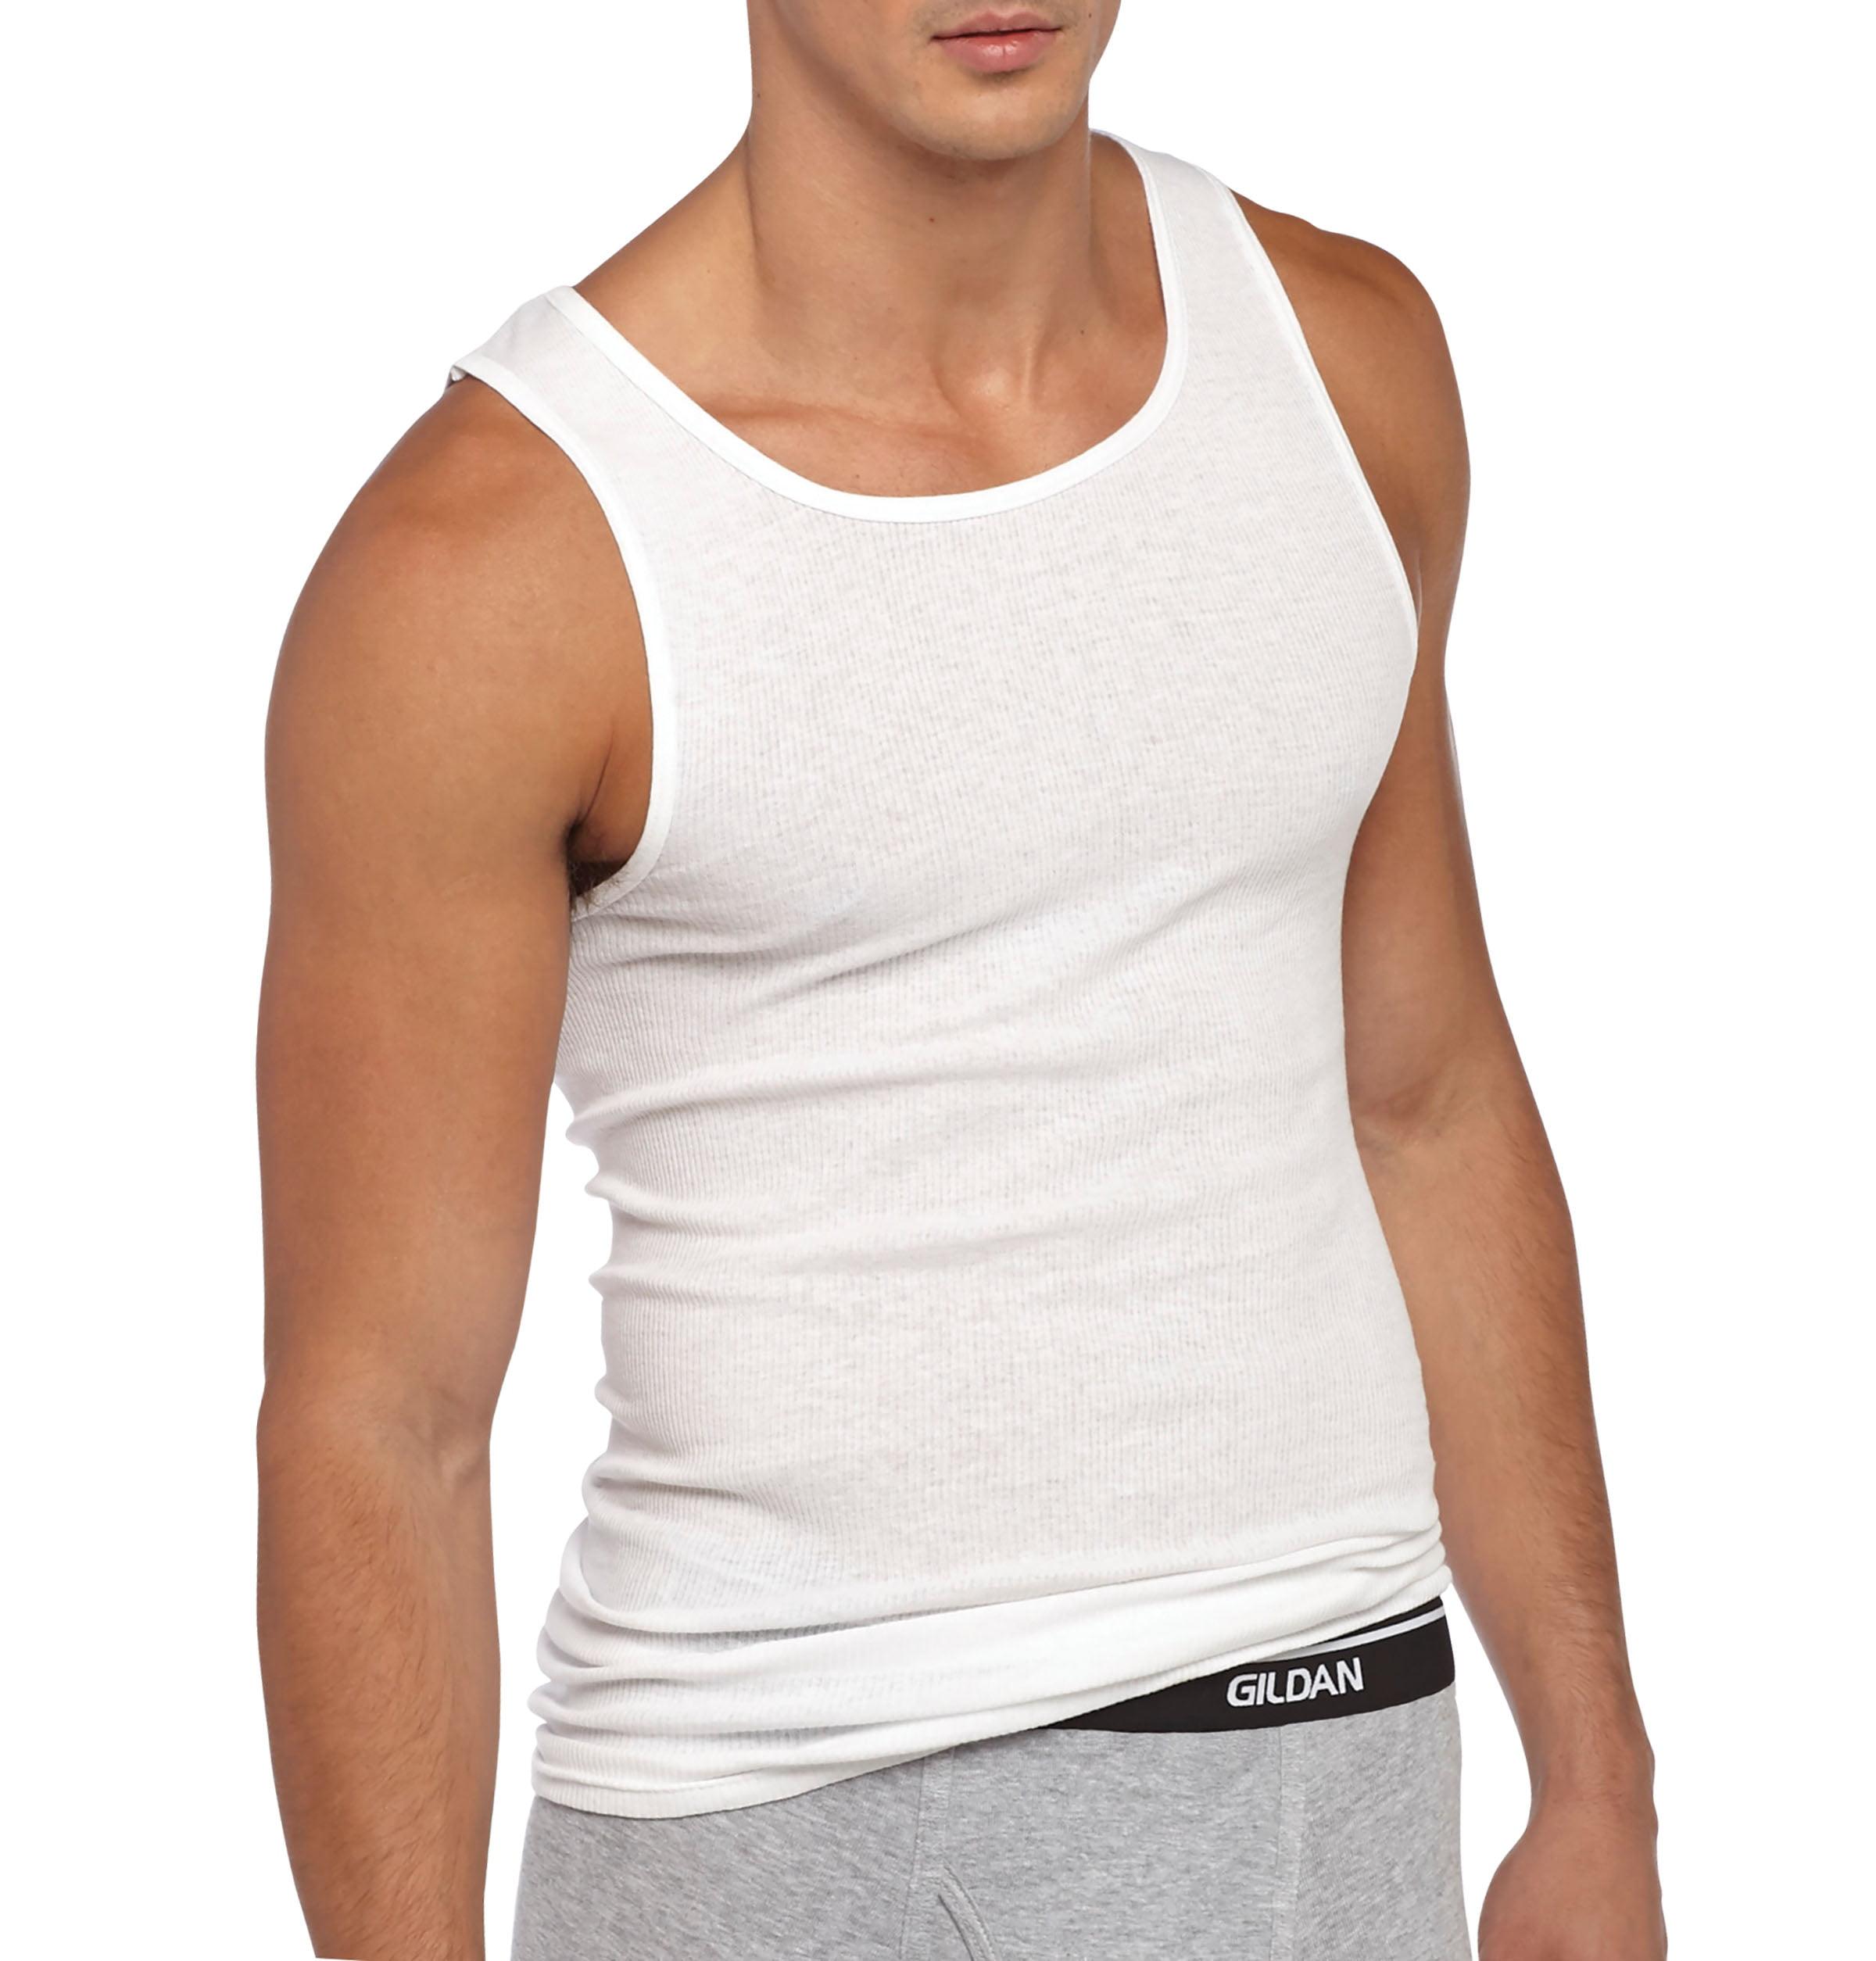 Gildan Big Men's Cotton Ribbed White A-Shirt, 4-Pack +1 Bonus